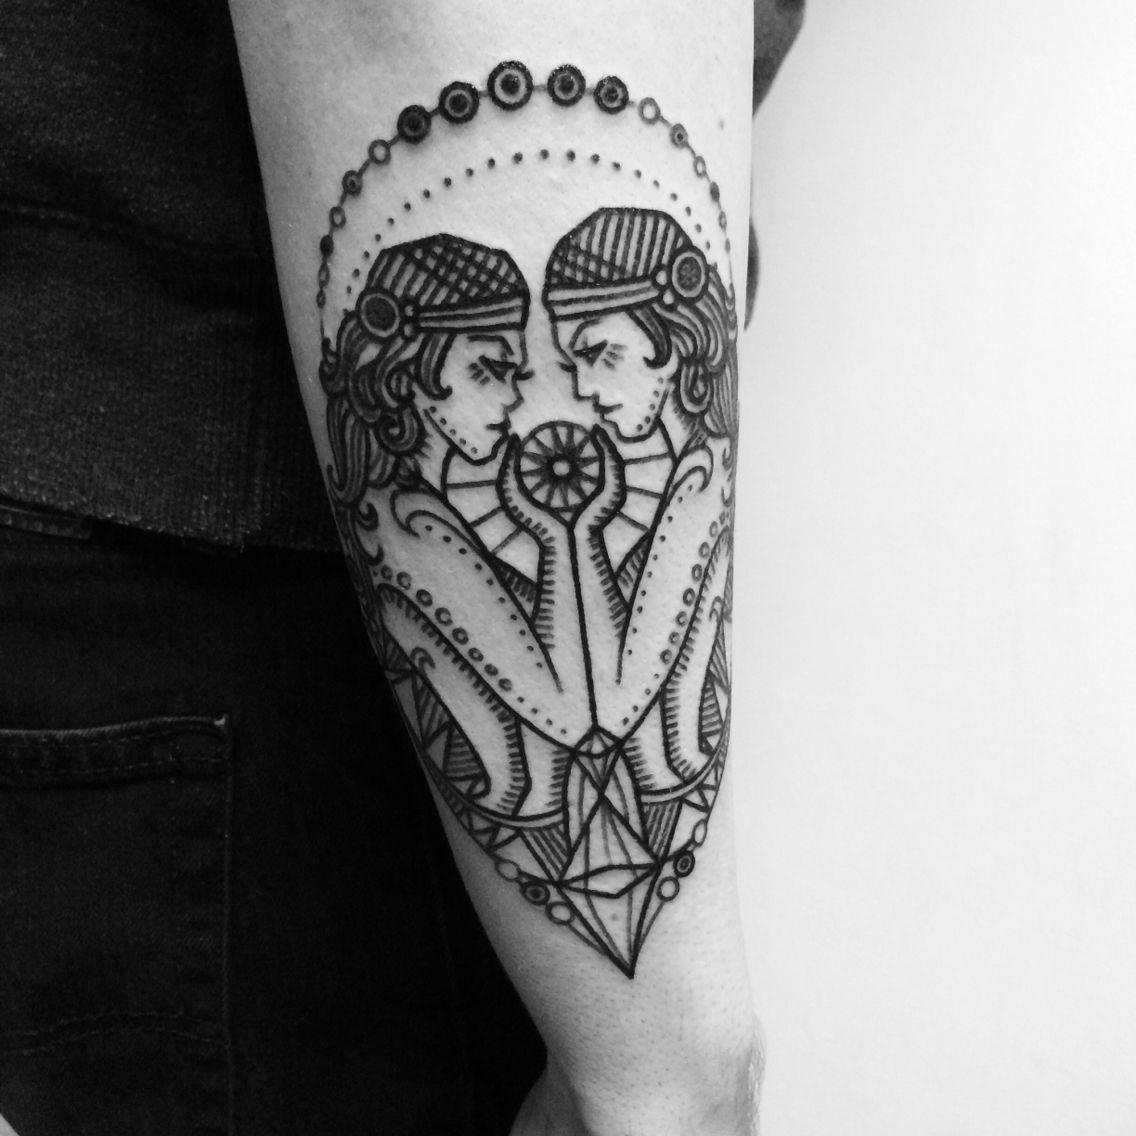 Gemini Tattoo Inspired By Vintage Zodiac Tattooed By Noelle